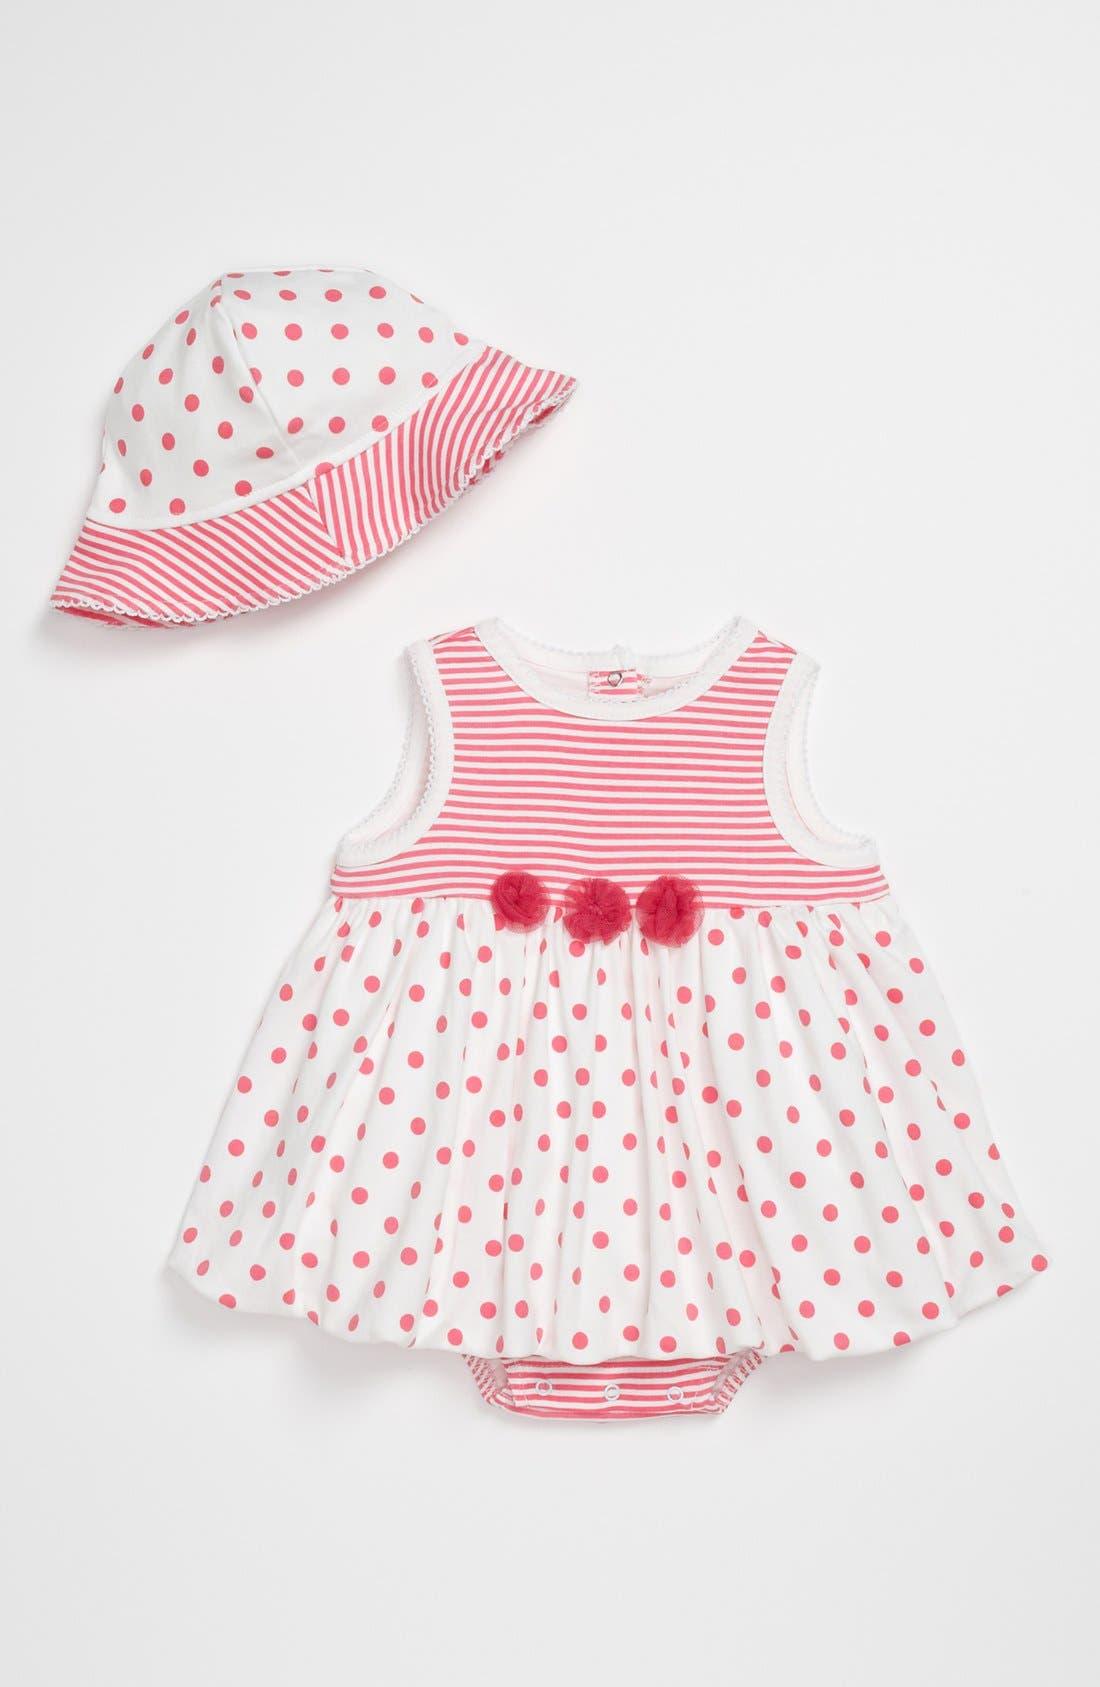 Alternate Image 1 Selected - Little Me Bodysuit & Hat (Baby)